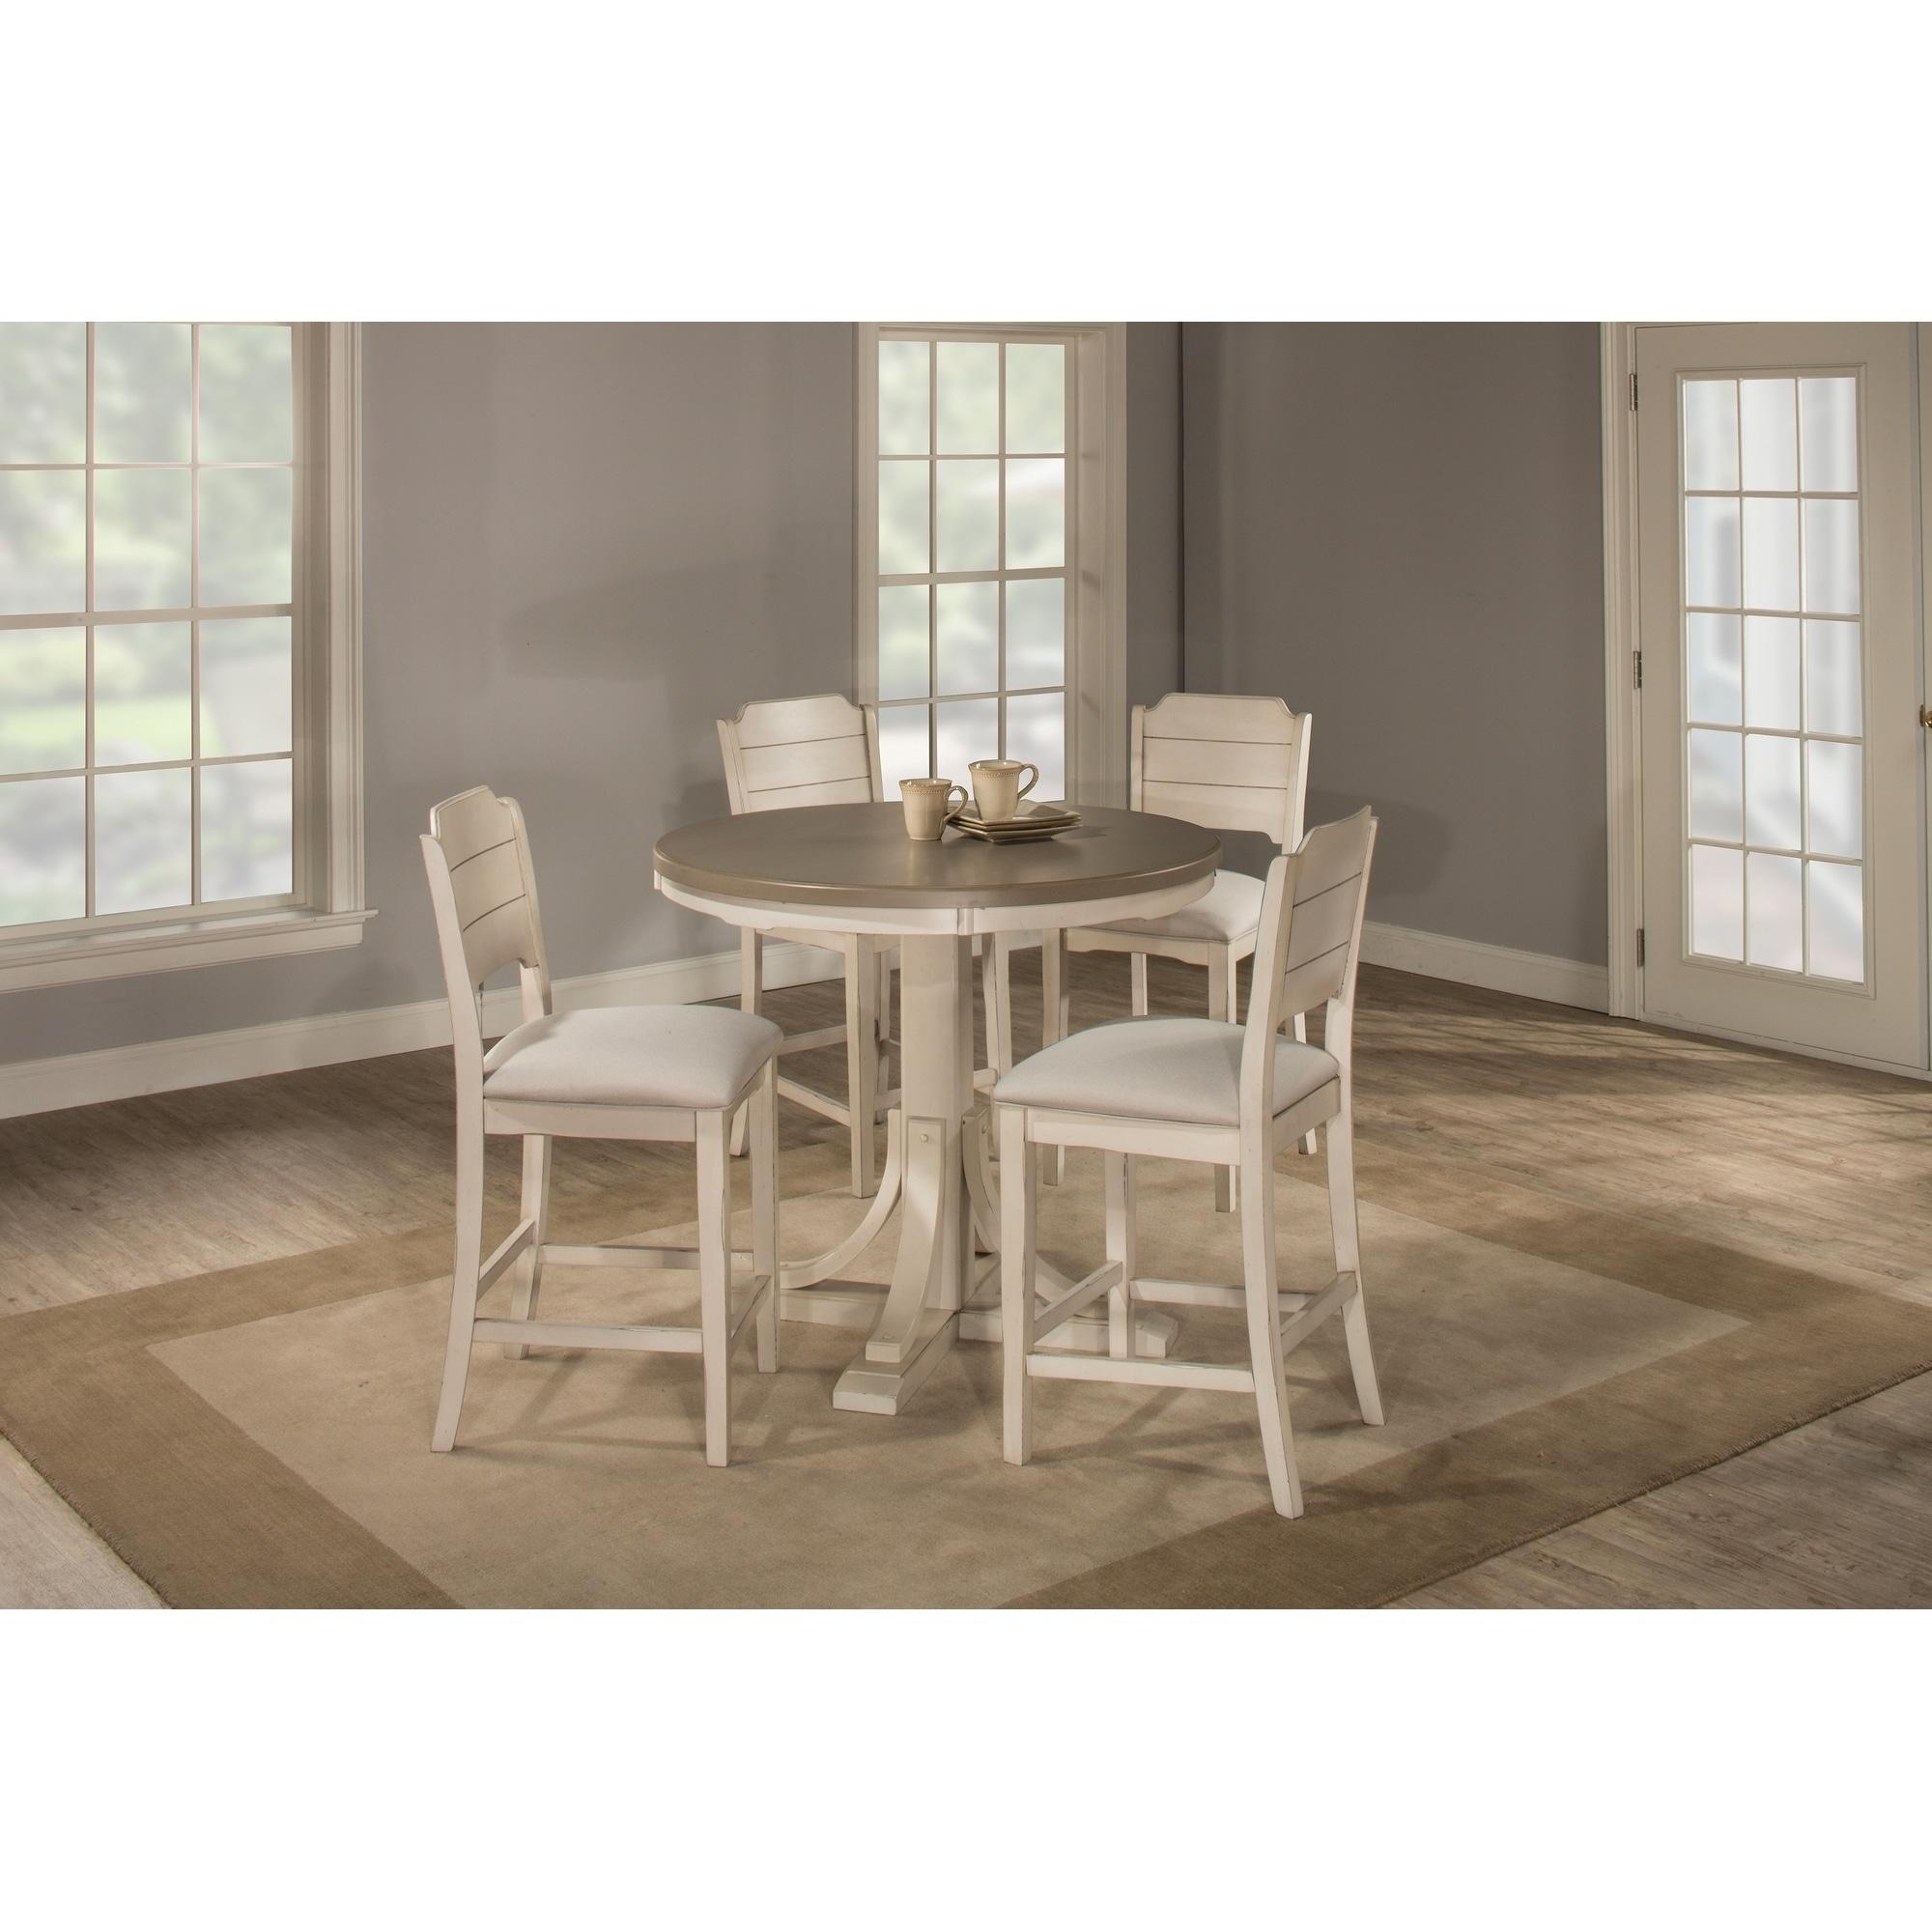 Havenside Home Santa Barbra 5-piece Round Counter Height Dining Set